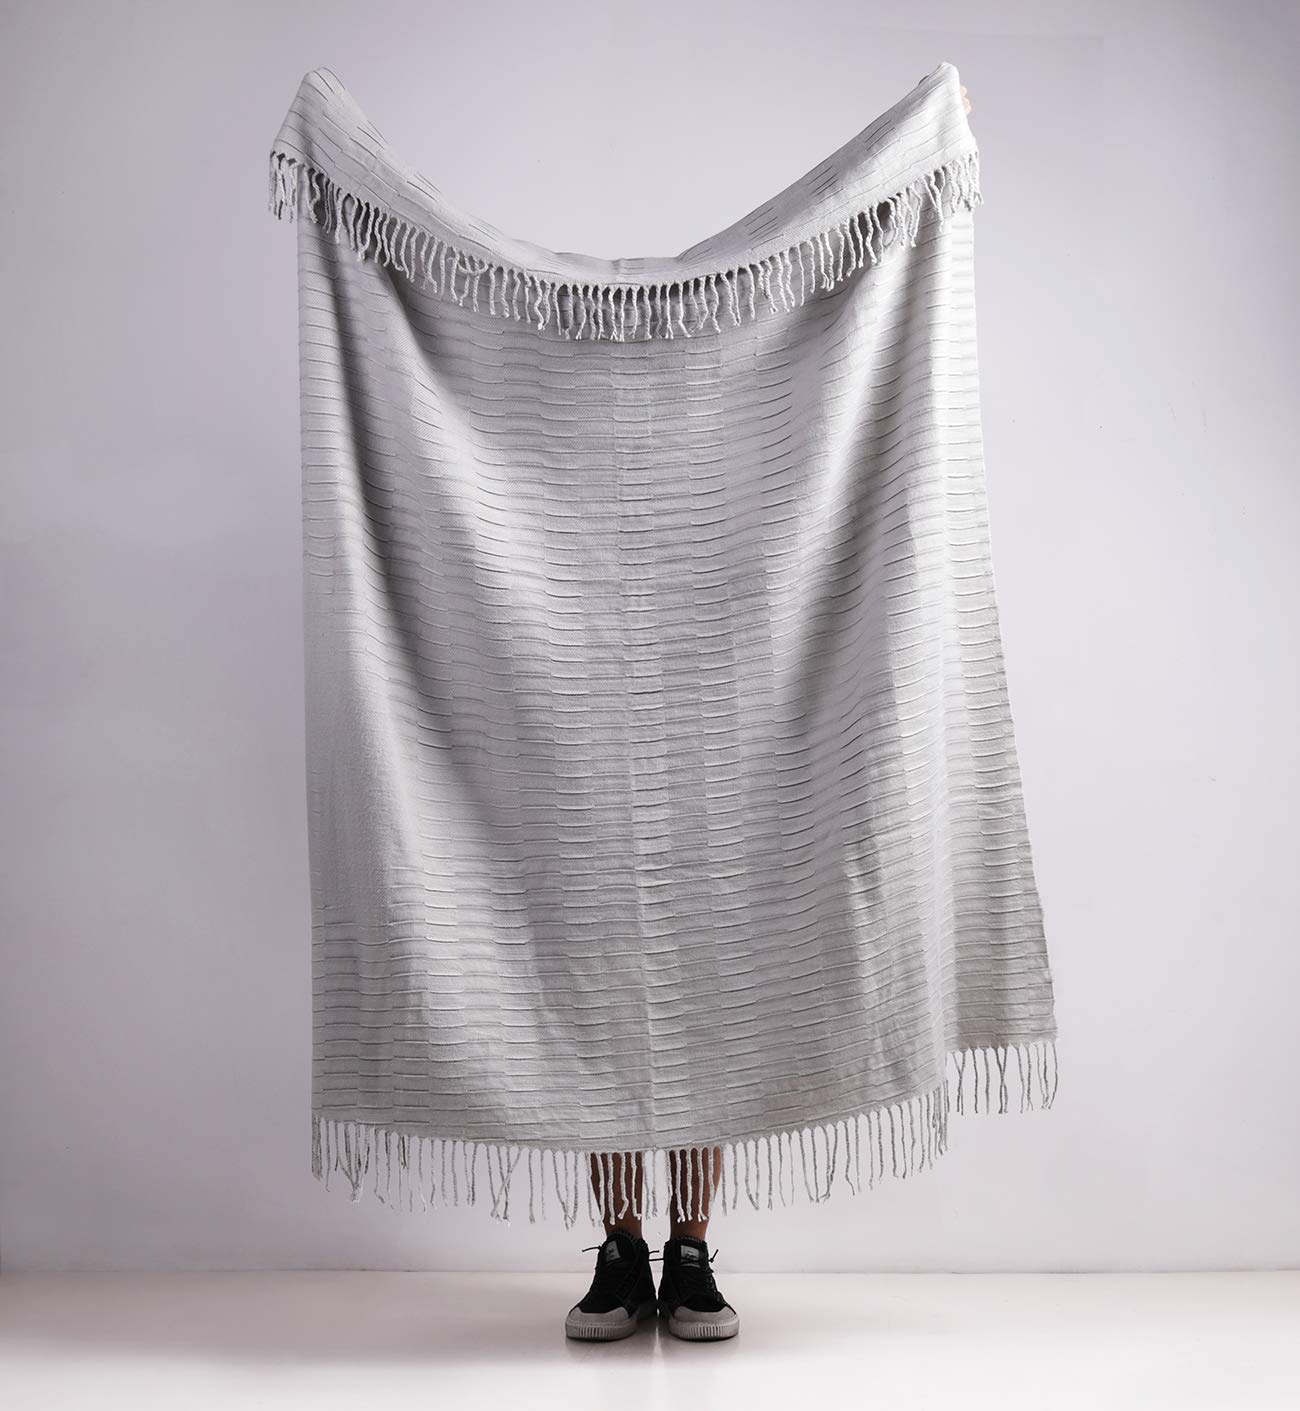 "PHF Knit Throw Blanket for Travel Picnic Beach Soft Chunky Cozy Fringed Warm Acrylic Texture Decorative, 50"" x 60"" Grey"